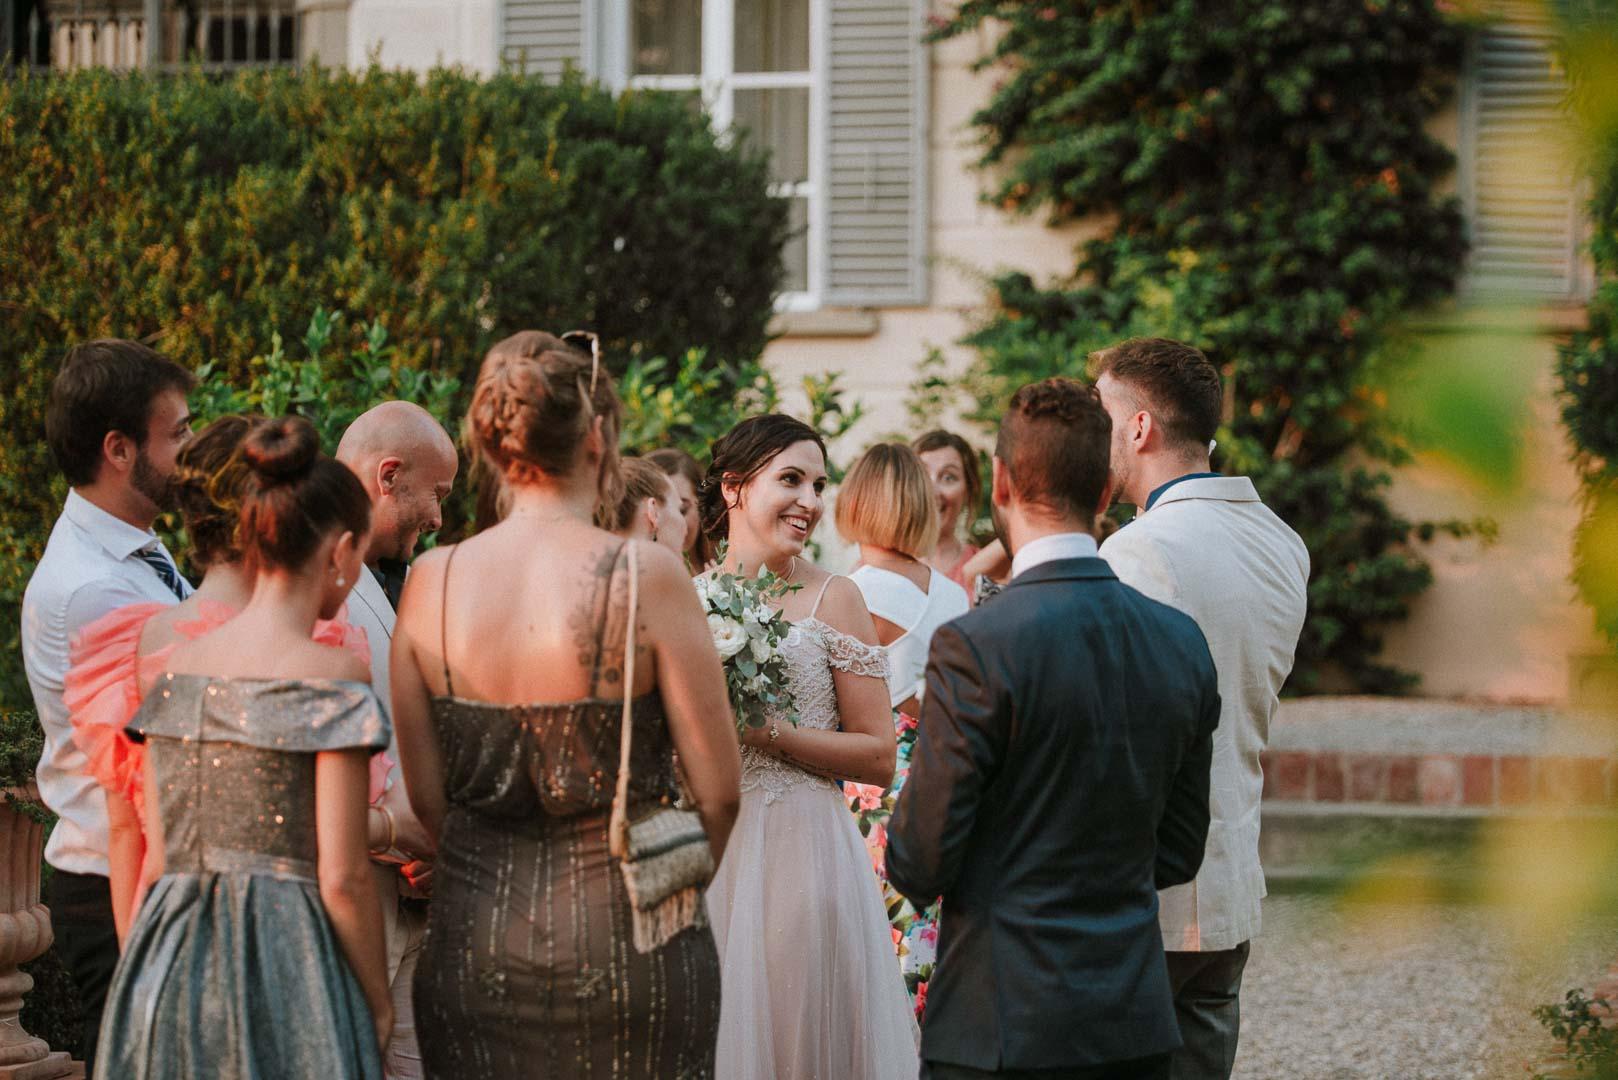 wedding-photographer-destination-fineart-bespoke-reportage-tuscany-villascorzi-vivianeizzo-spazio46-146